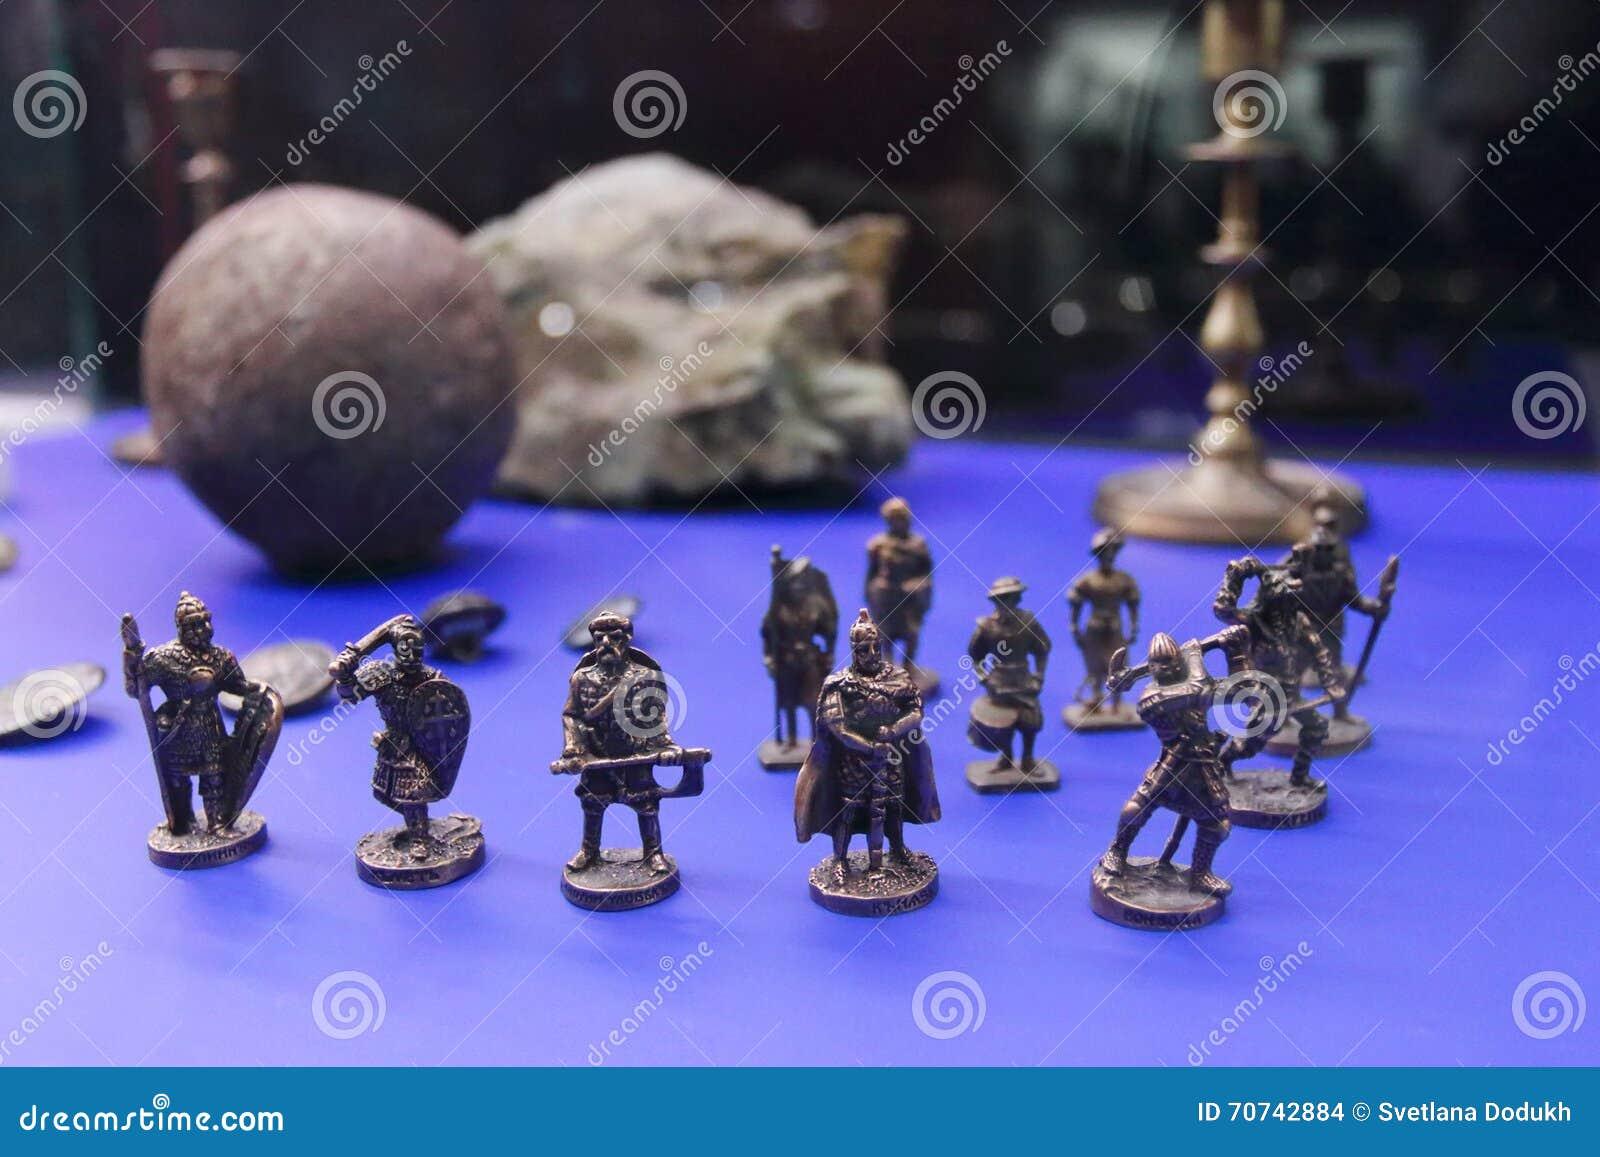 Miniature figurines of warriors